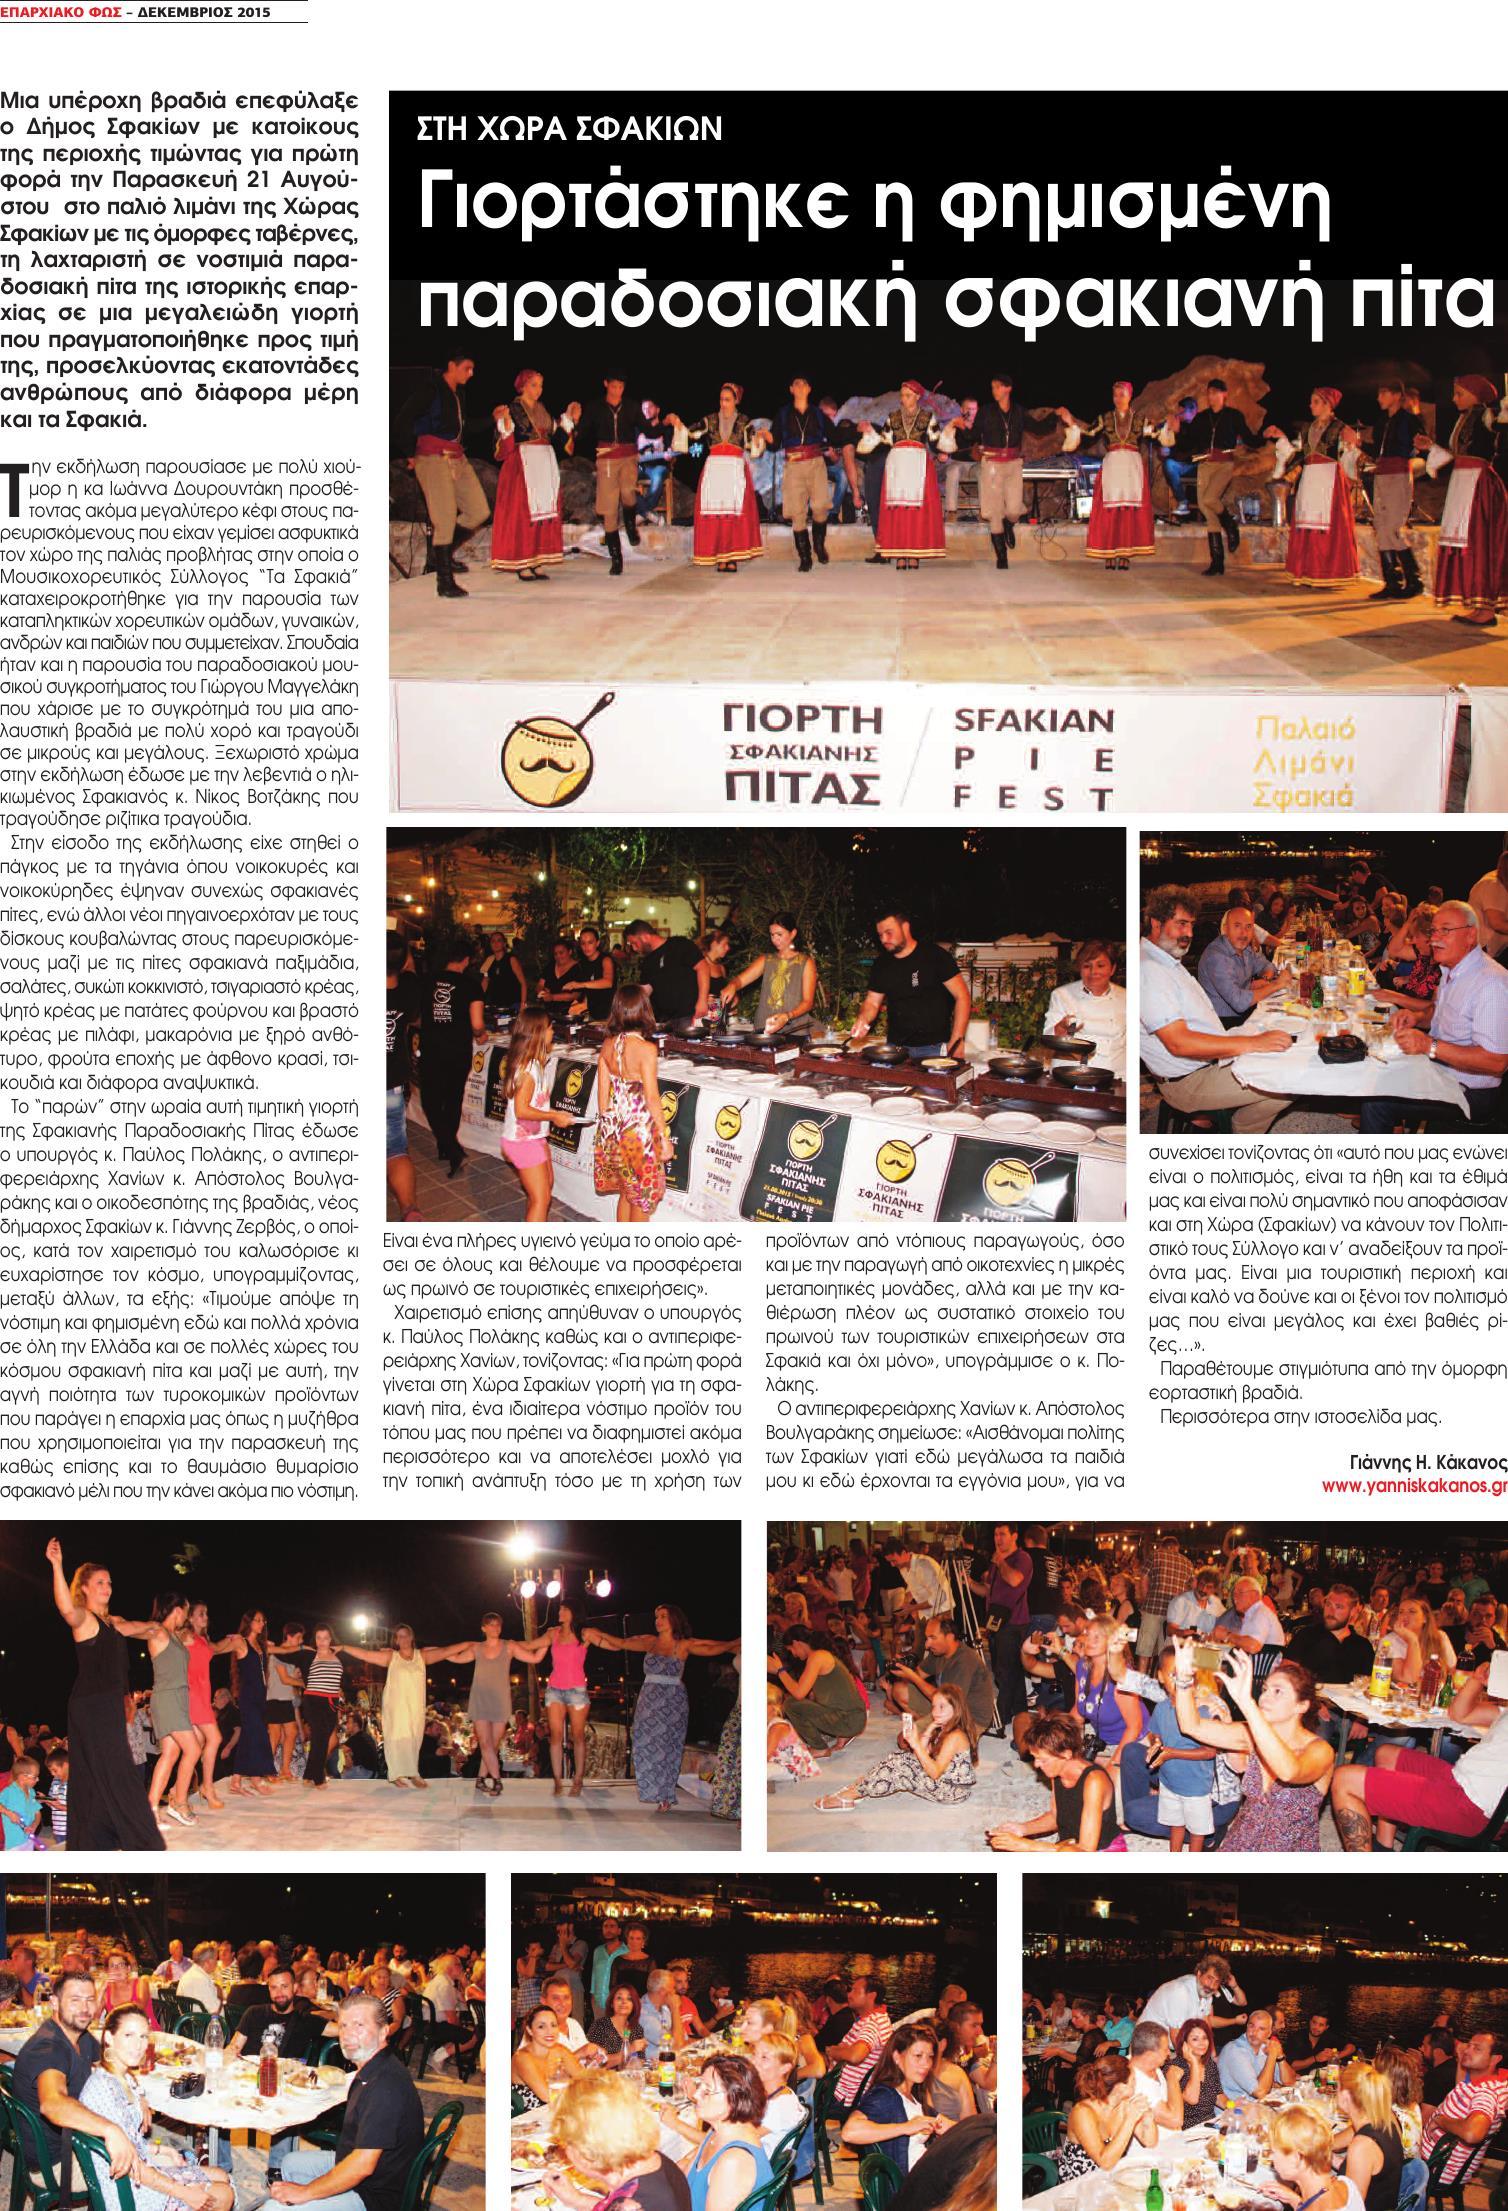 12 KAKANOS (Page 06)